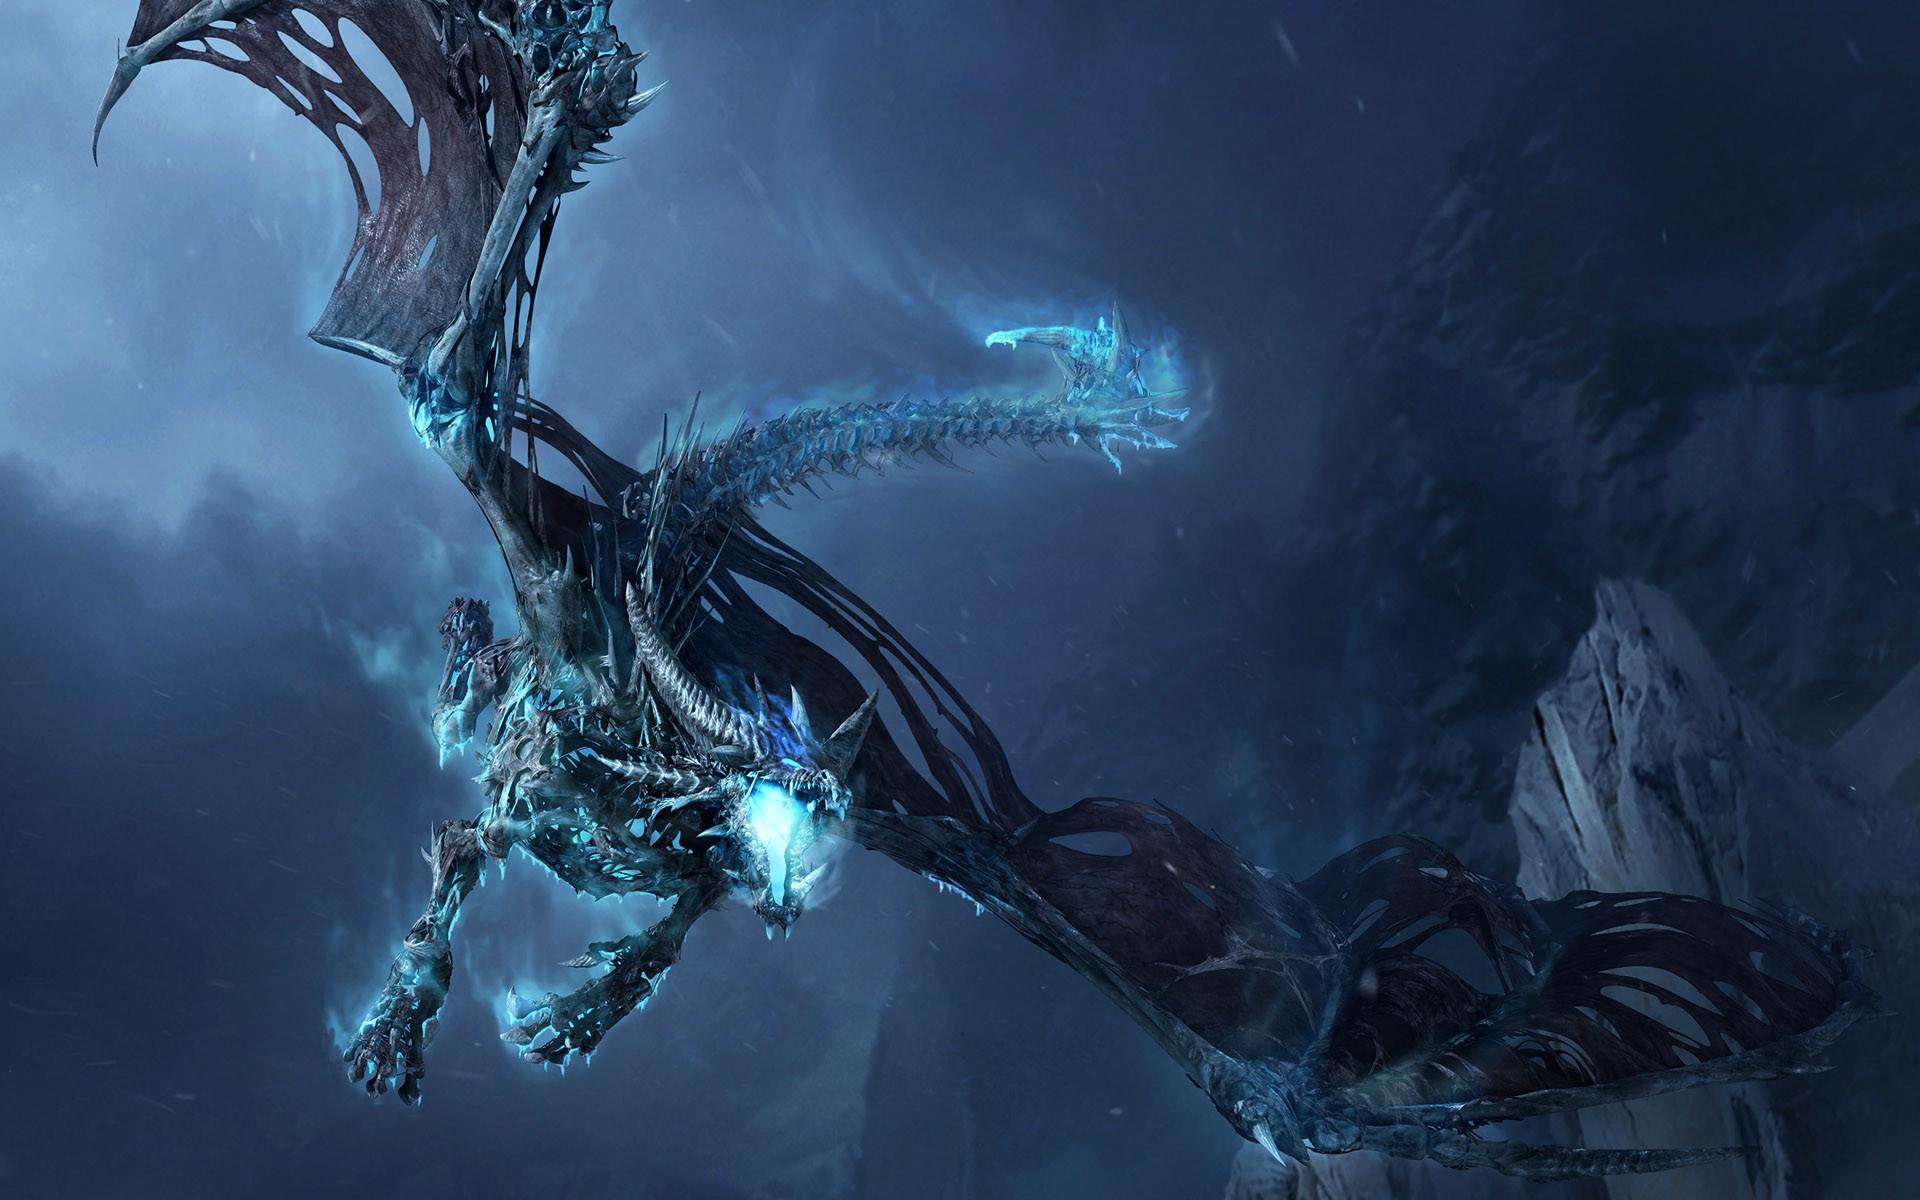 Dragons Undead Dracolich World Of Warcraft Wrath The Lich King Frostwyrm …